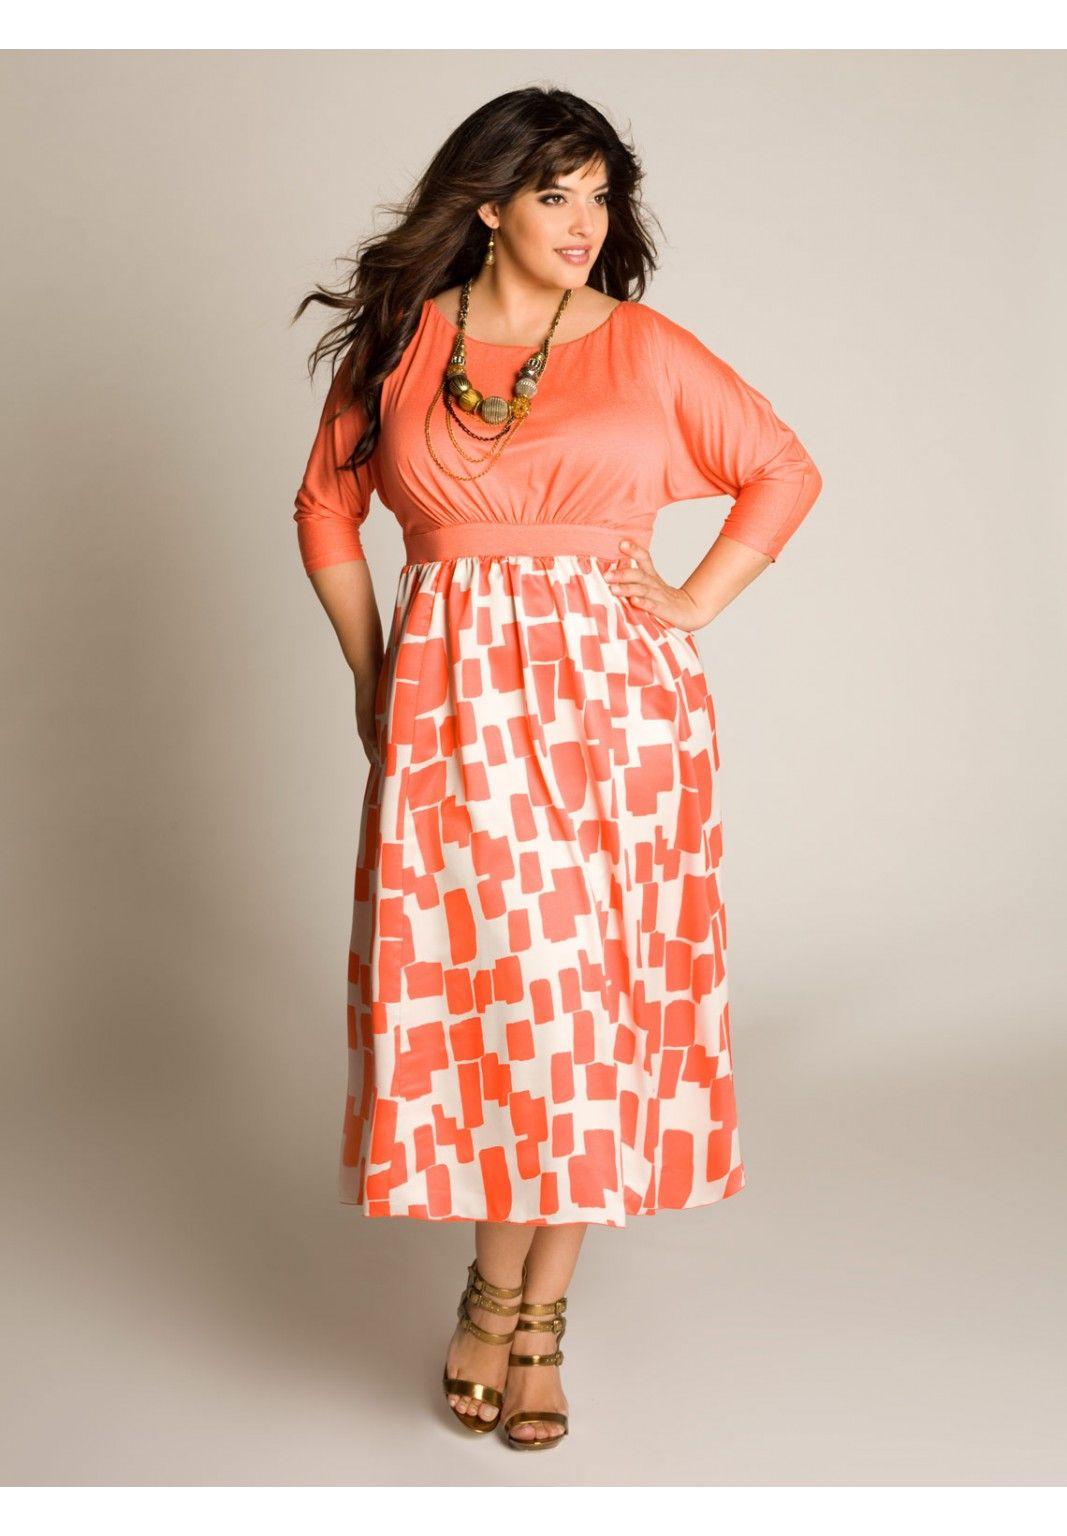 Plus Size Katelyn Dress In Tahiti Coral Image Curvy Girl Fashion Modest Dresses Plus Size Dresses